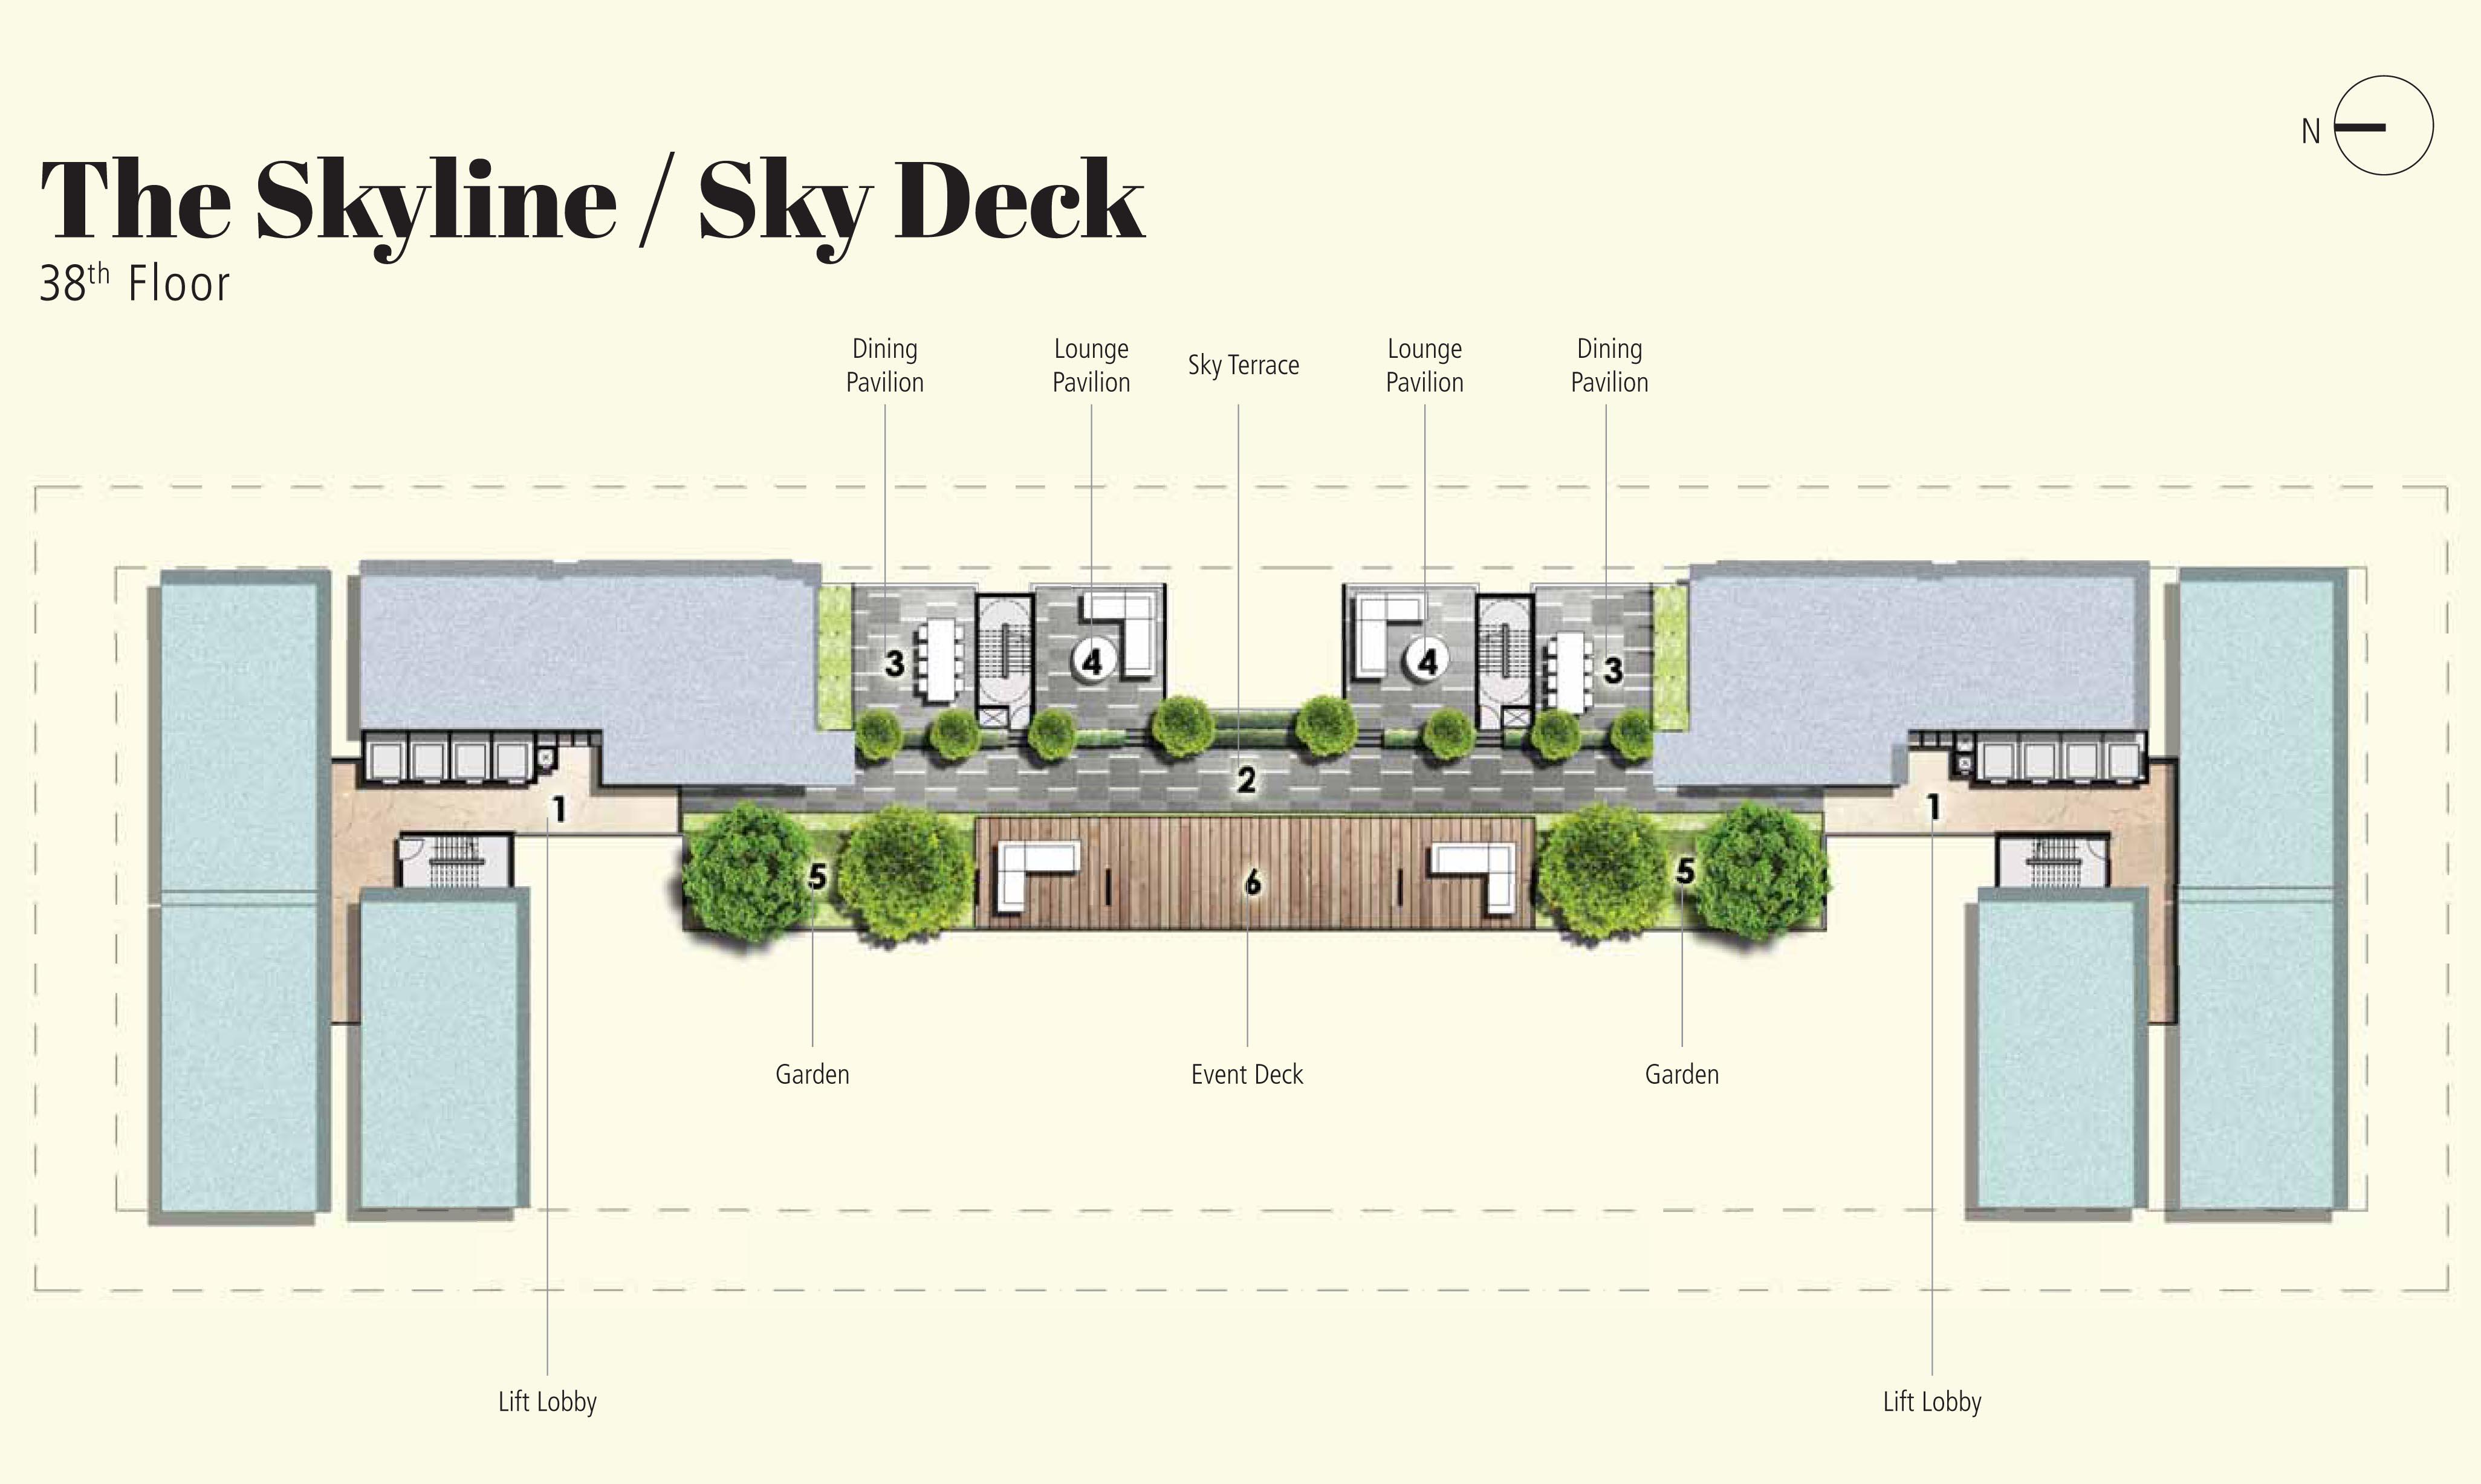 38th Floor plan